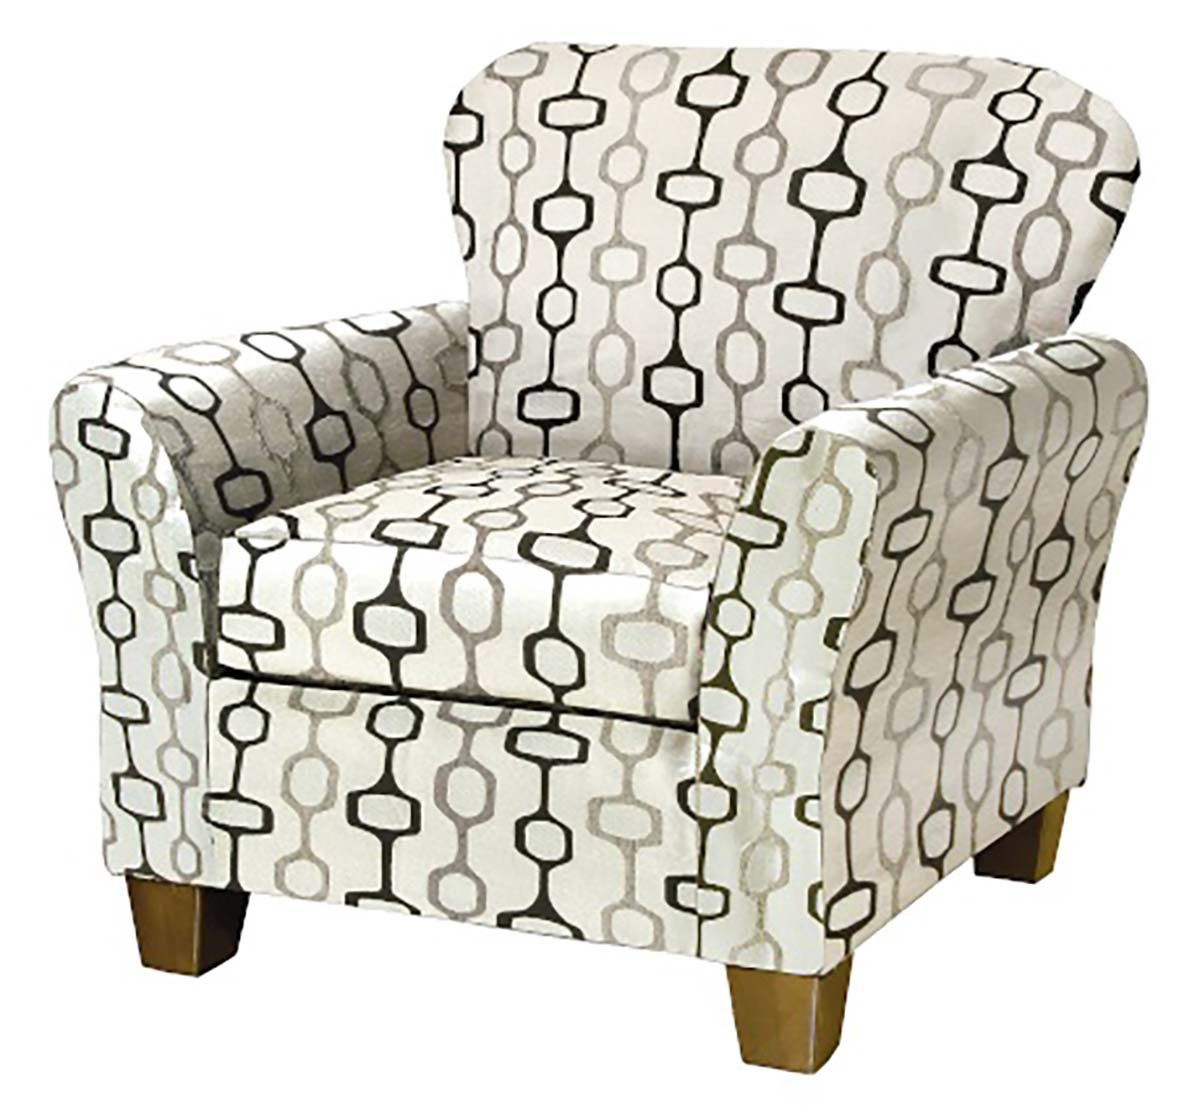 Serta 3010 Accent Chair Handcuff